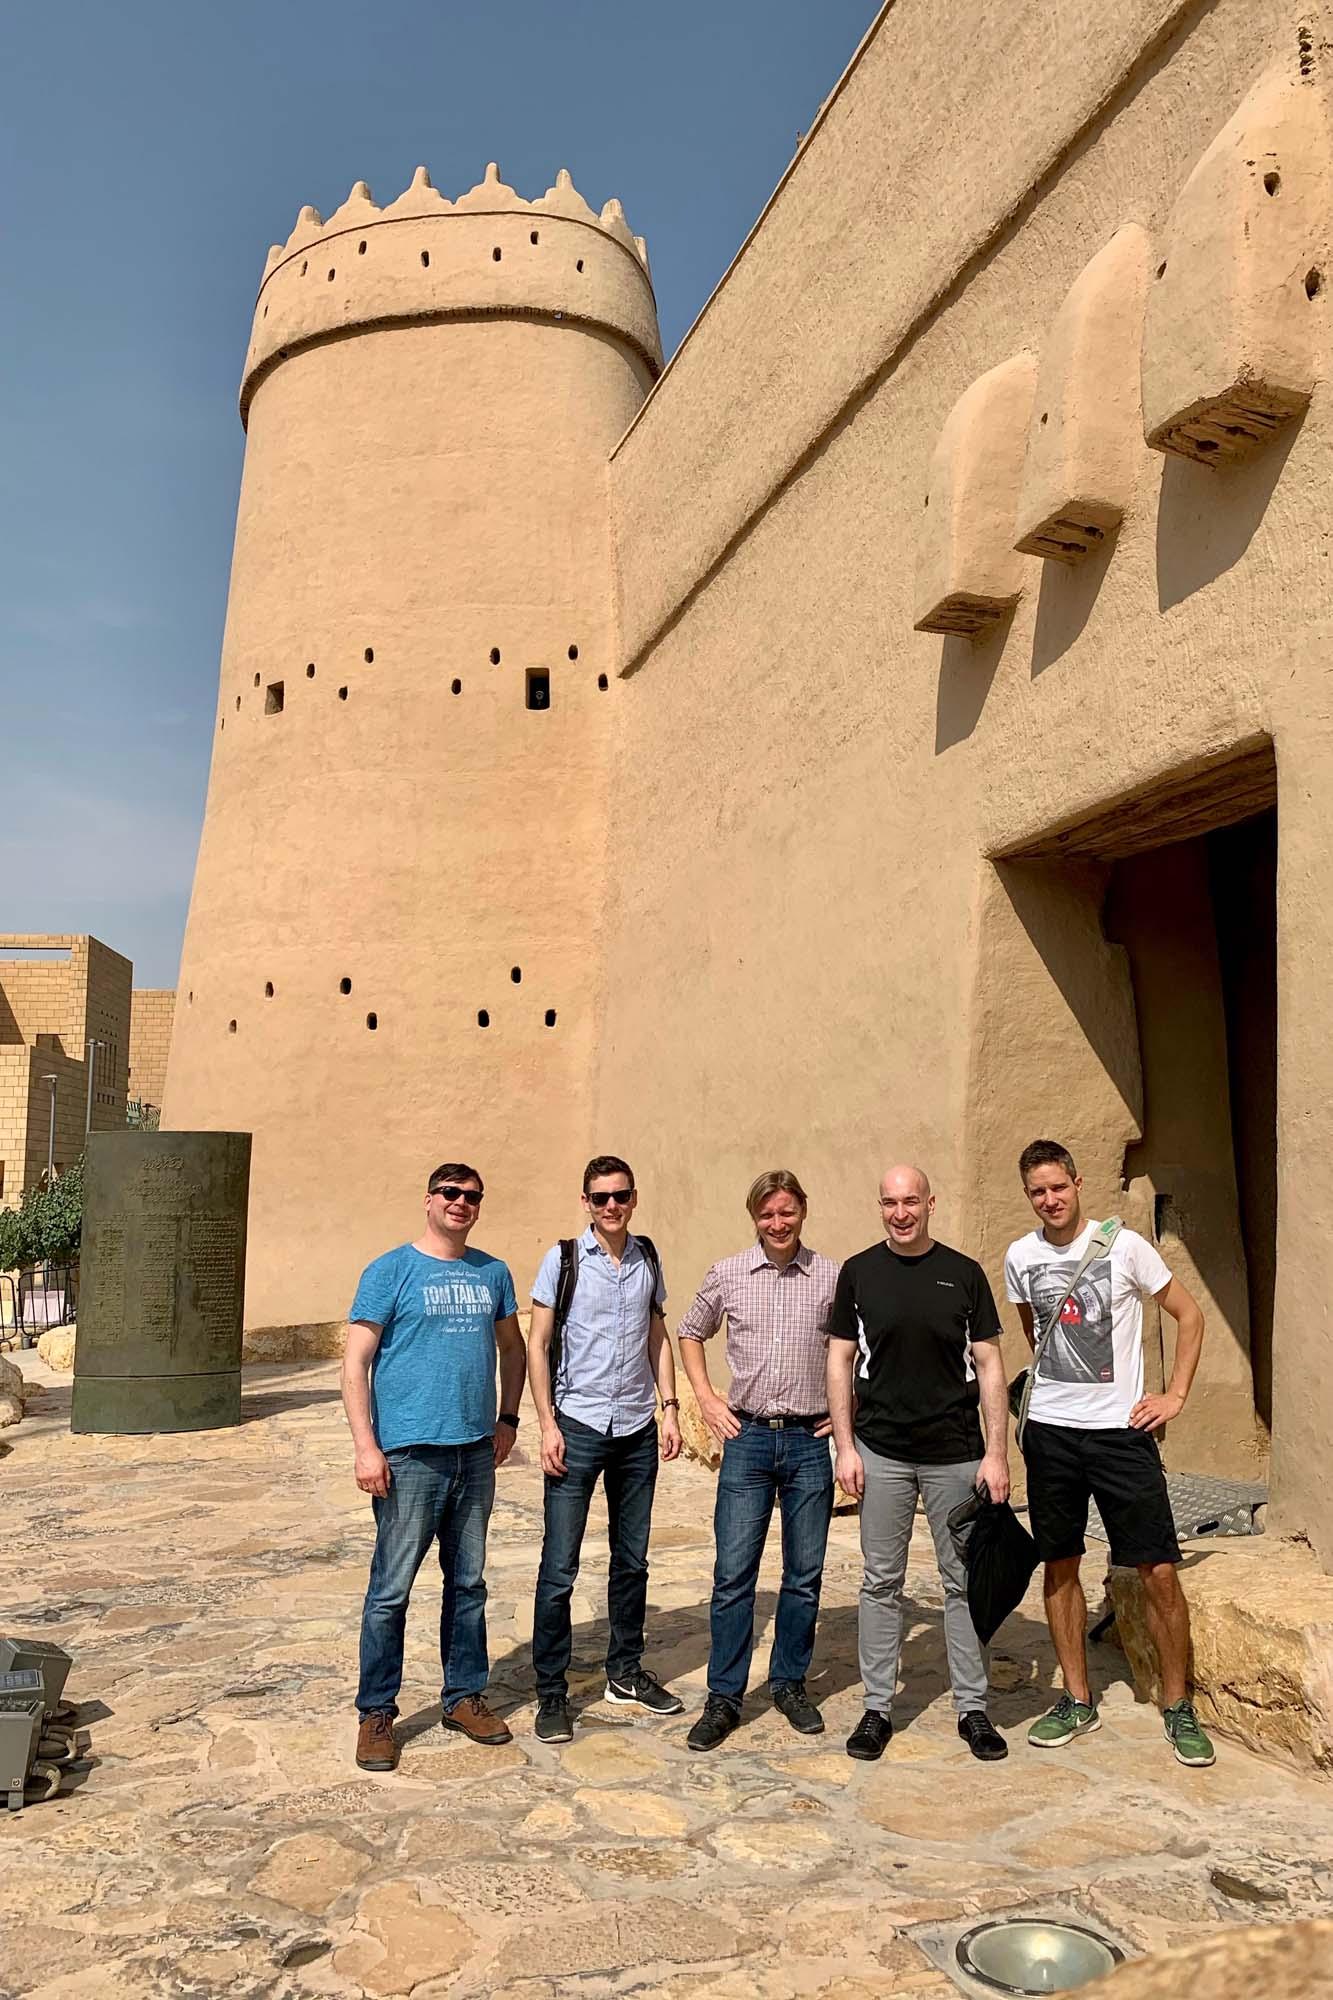 Sightsseing in Riad